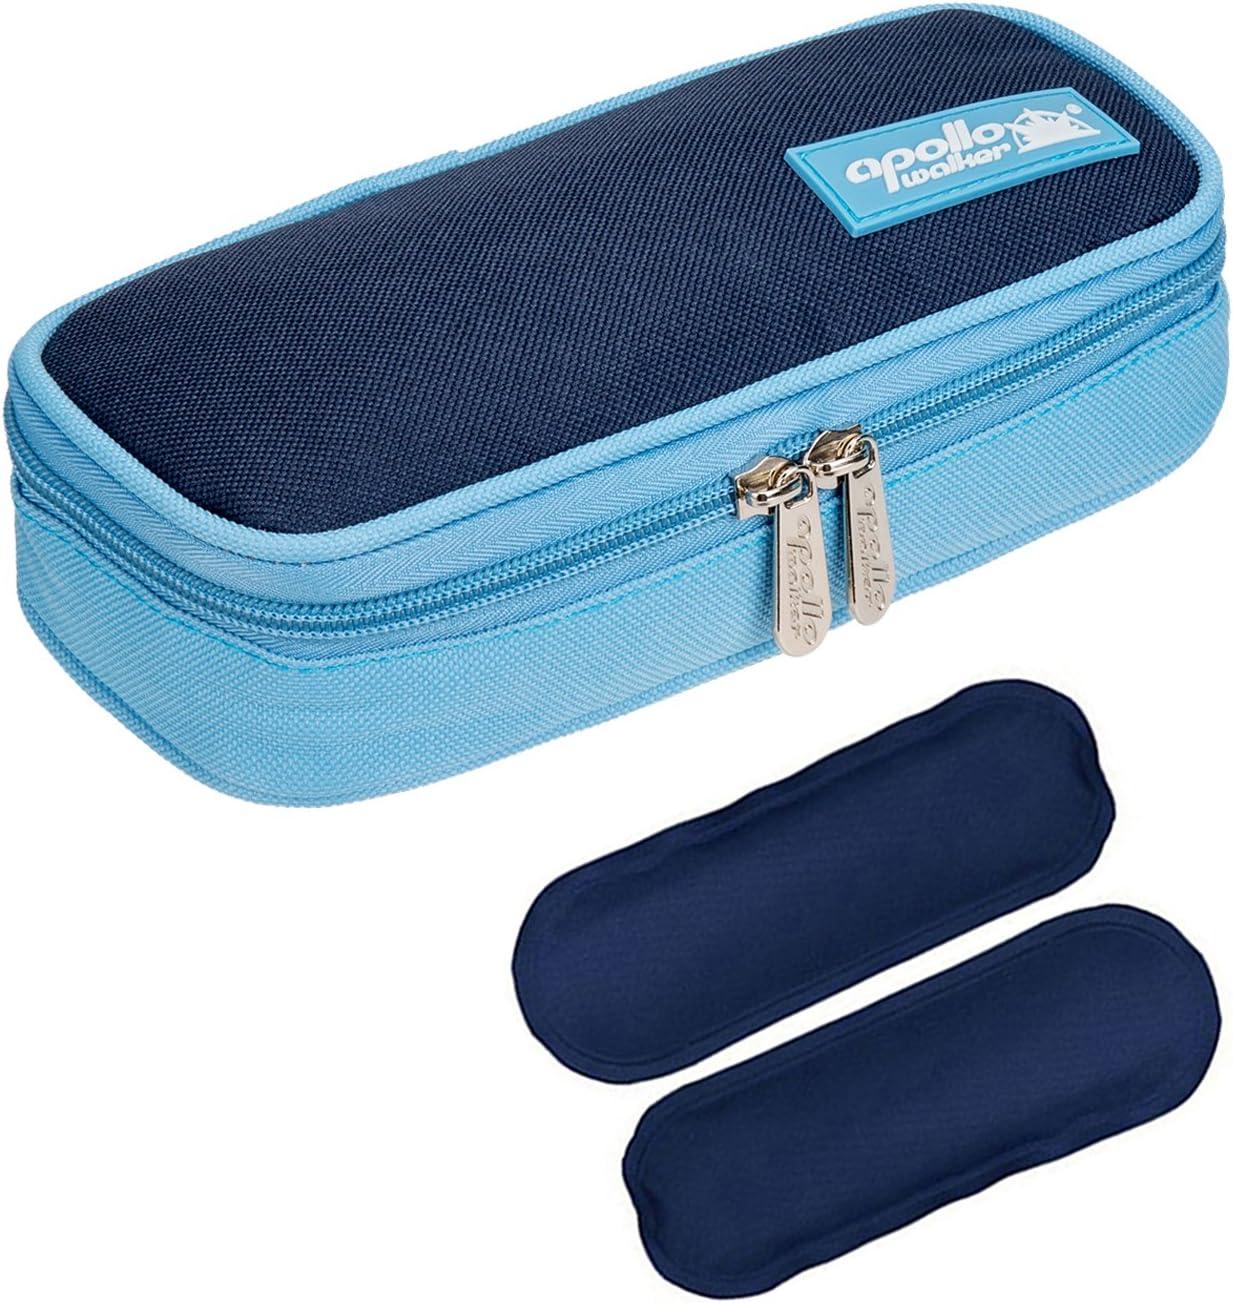 Bolsa diabética ONEGenug Enfriador de insulina Bolsa Bolsa de jeringas para la diabetes, insulina y medicamentos 20x4x9cm